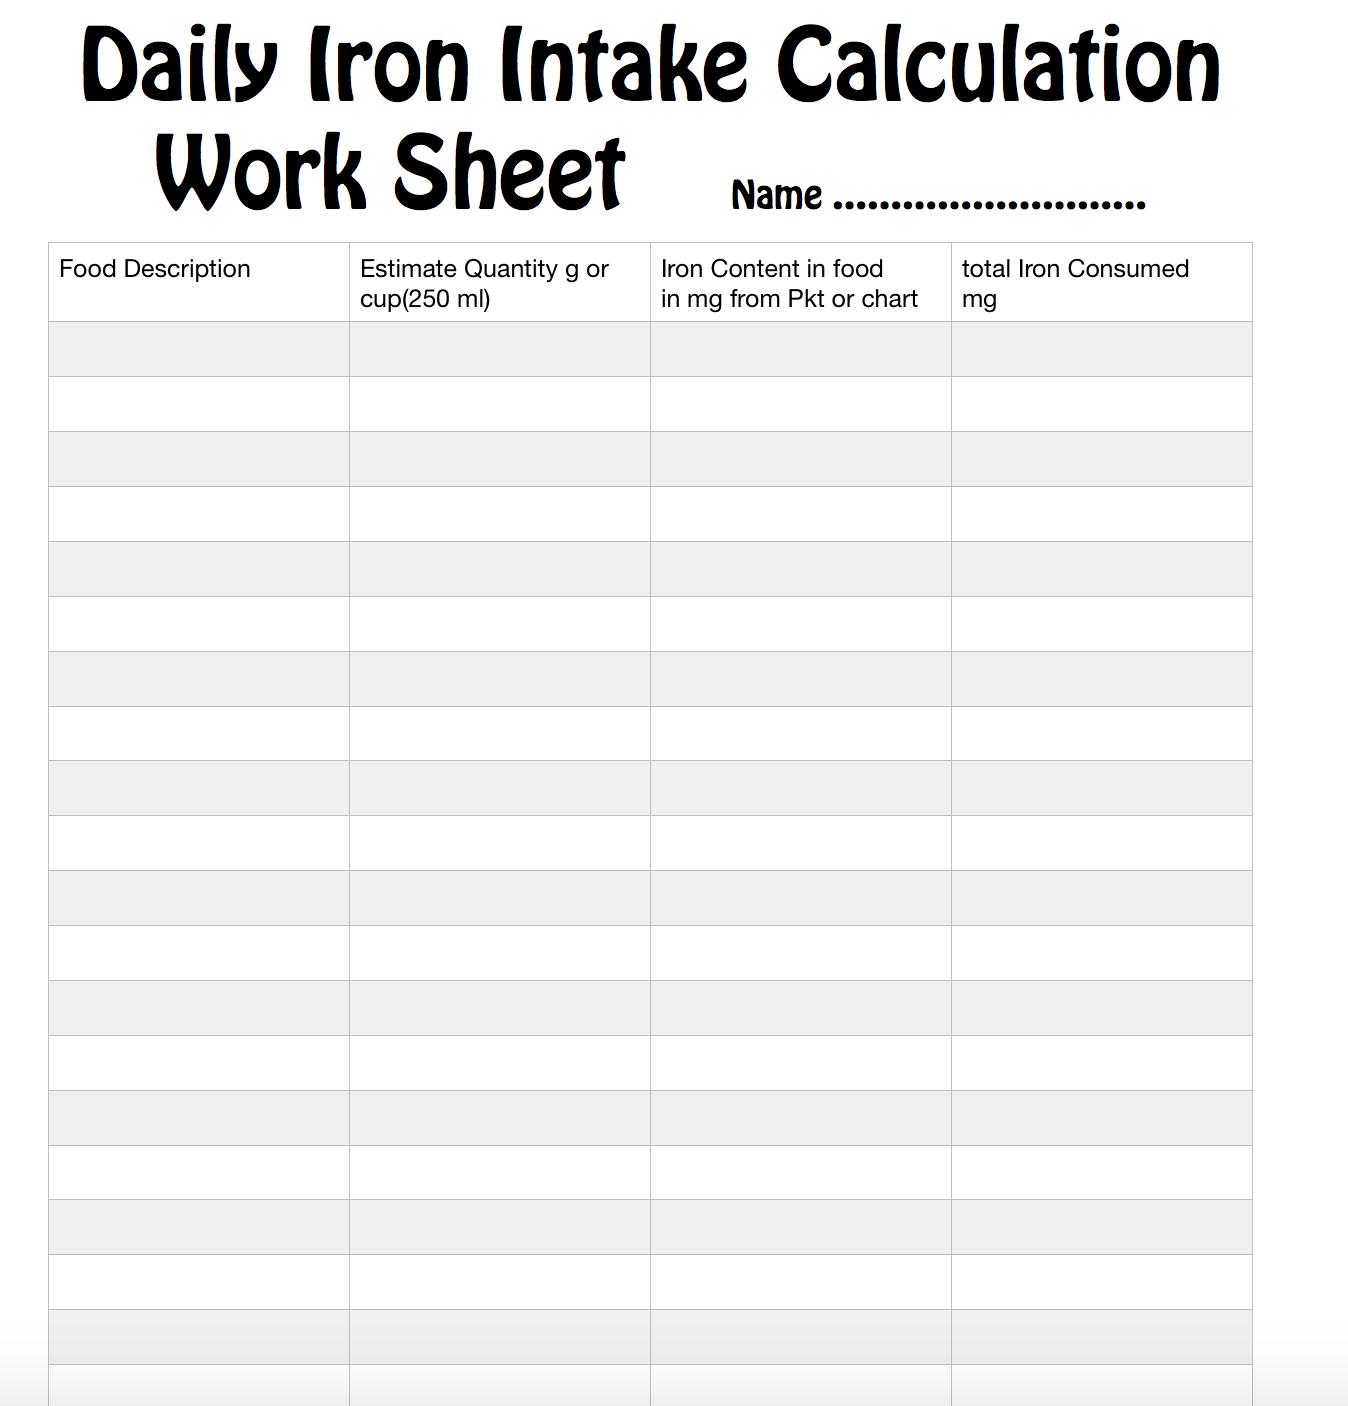 Units weight mathspig blog full page worksheet pdfdaily iron intake calculation work sheet geenschuldenfo Choice Image